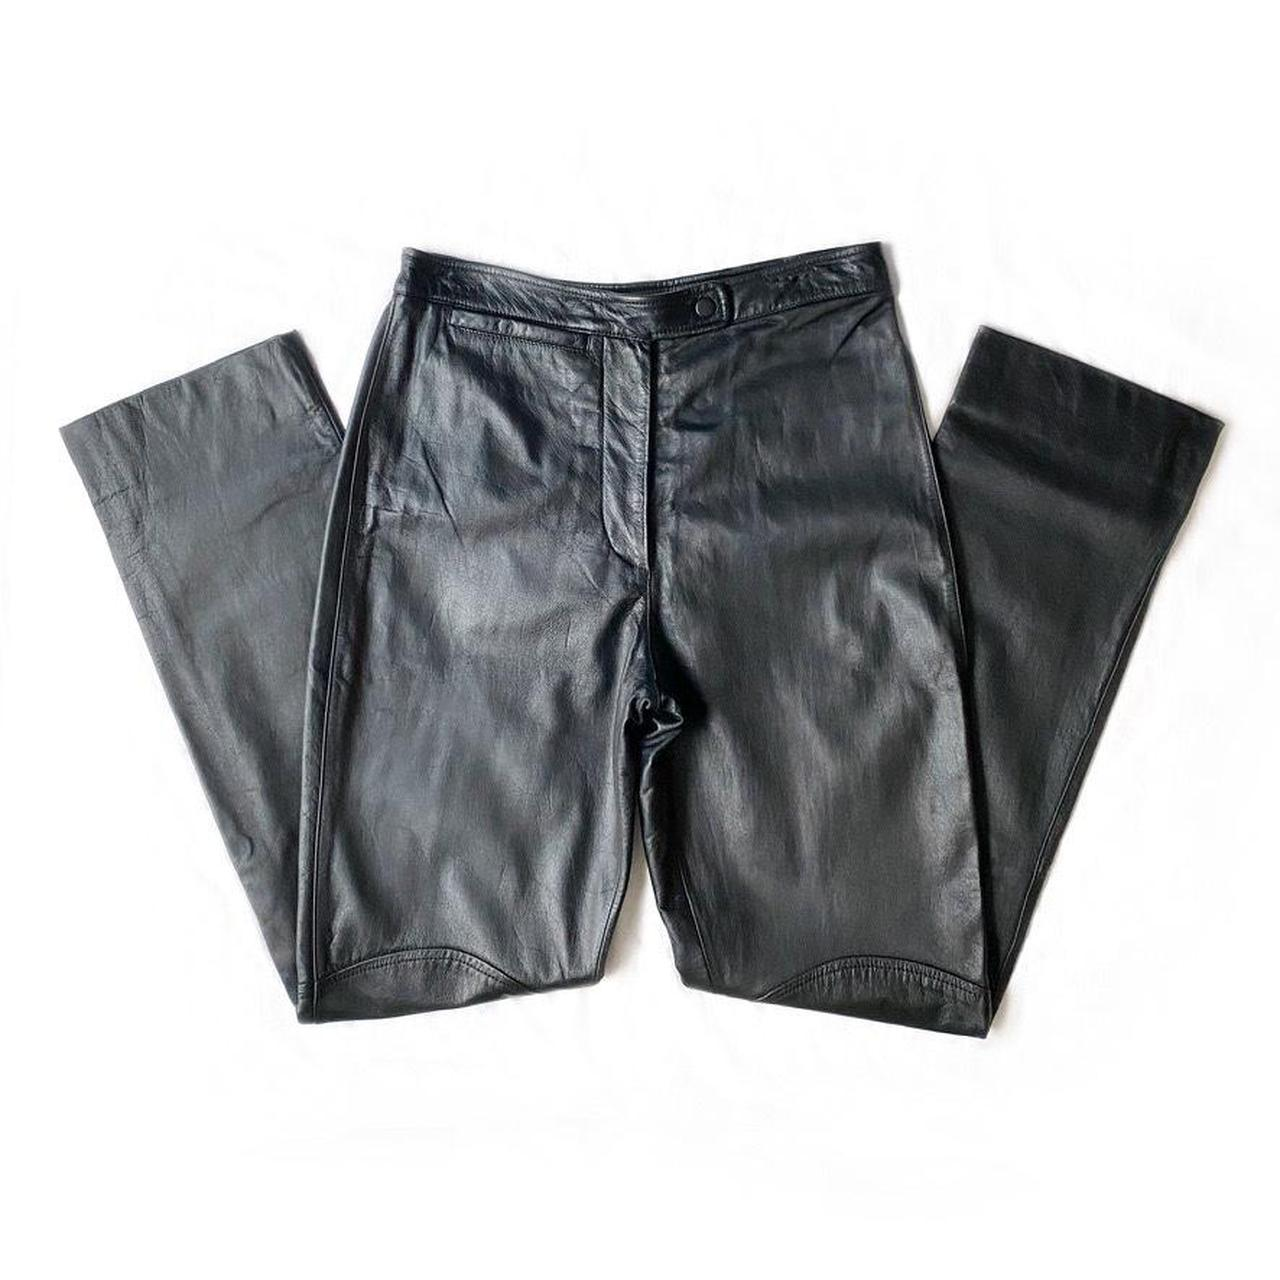 Product Image 1 - Vintage black leather pants. Has